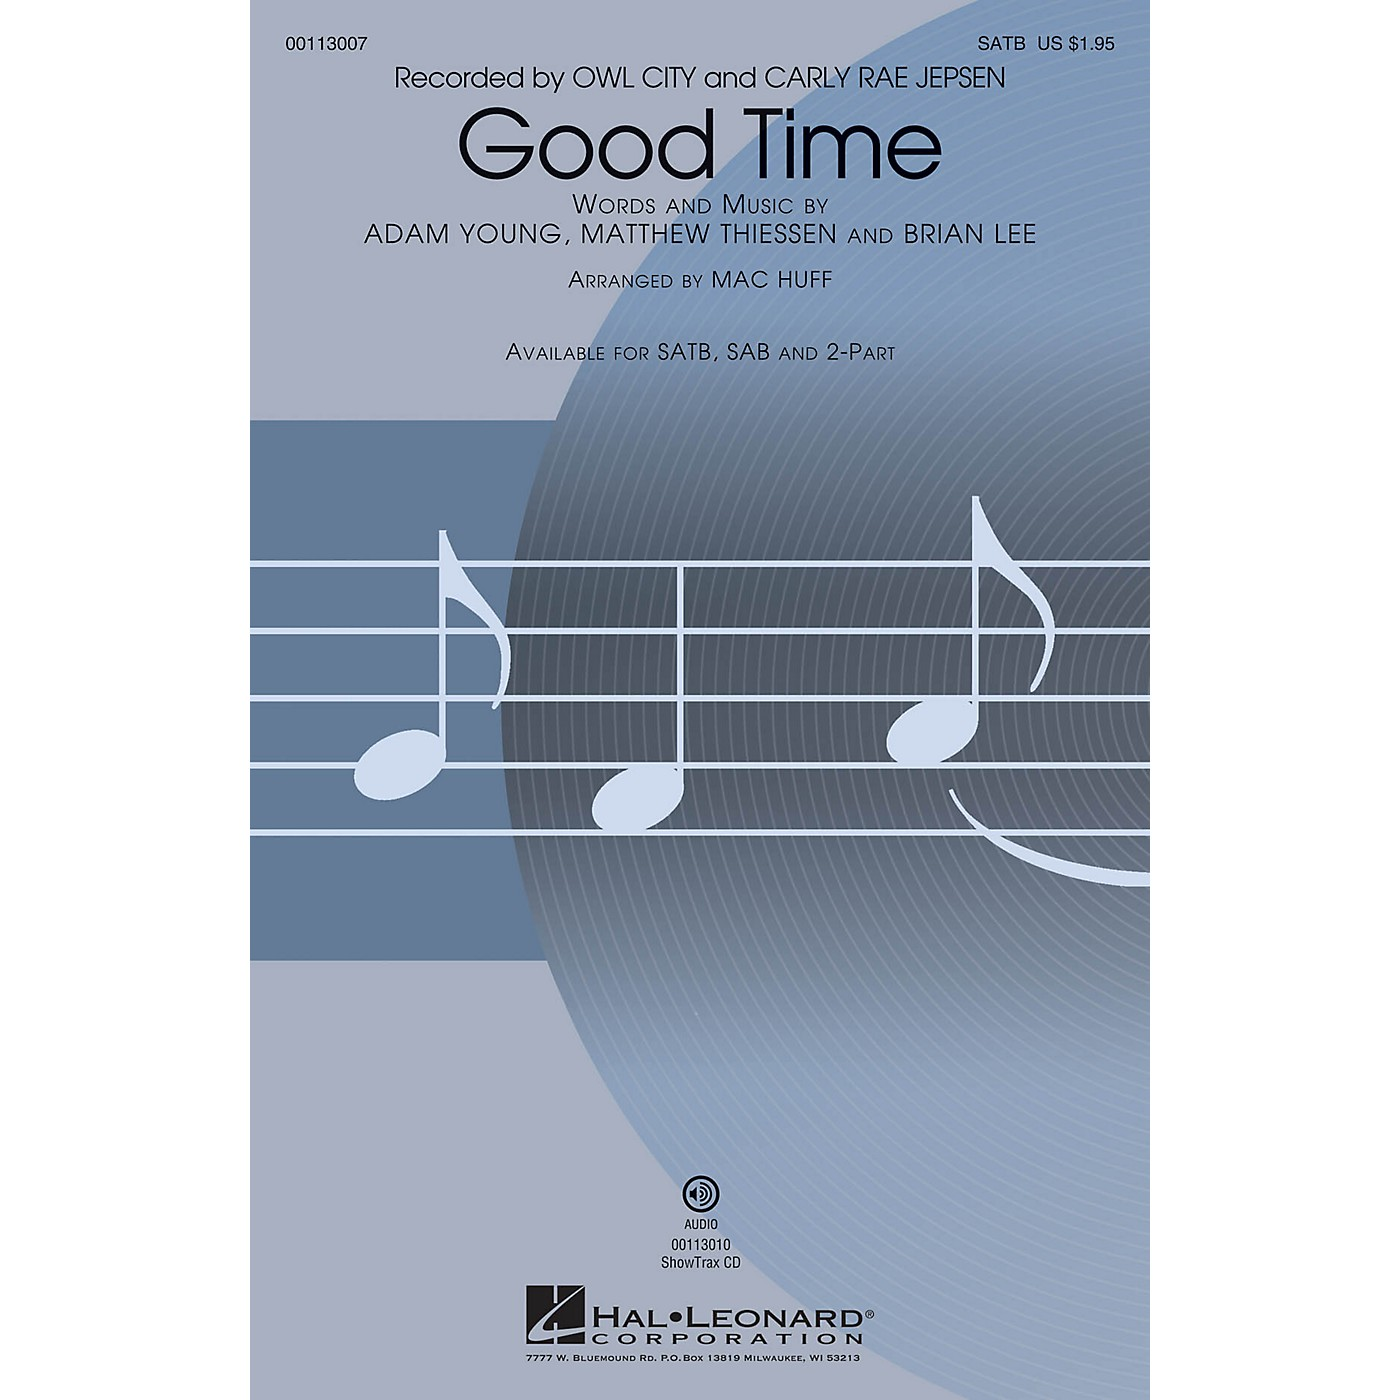 Hal Leonard Good Time (SAB) SAB by Owl City Arranged by Mac Huff thumbnail